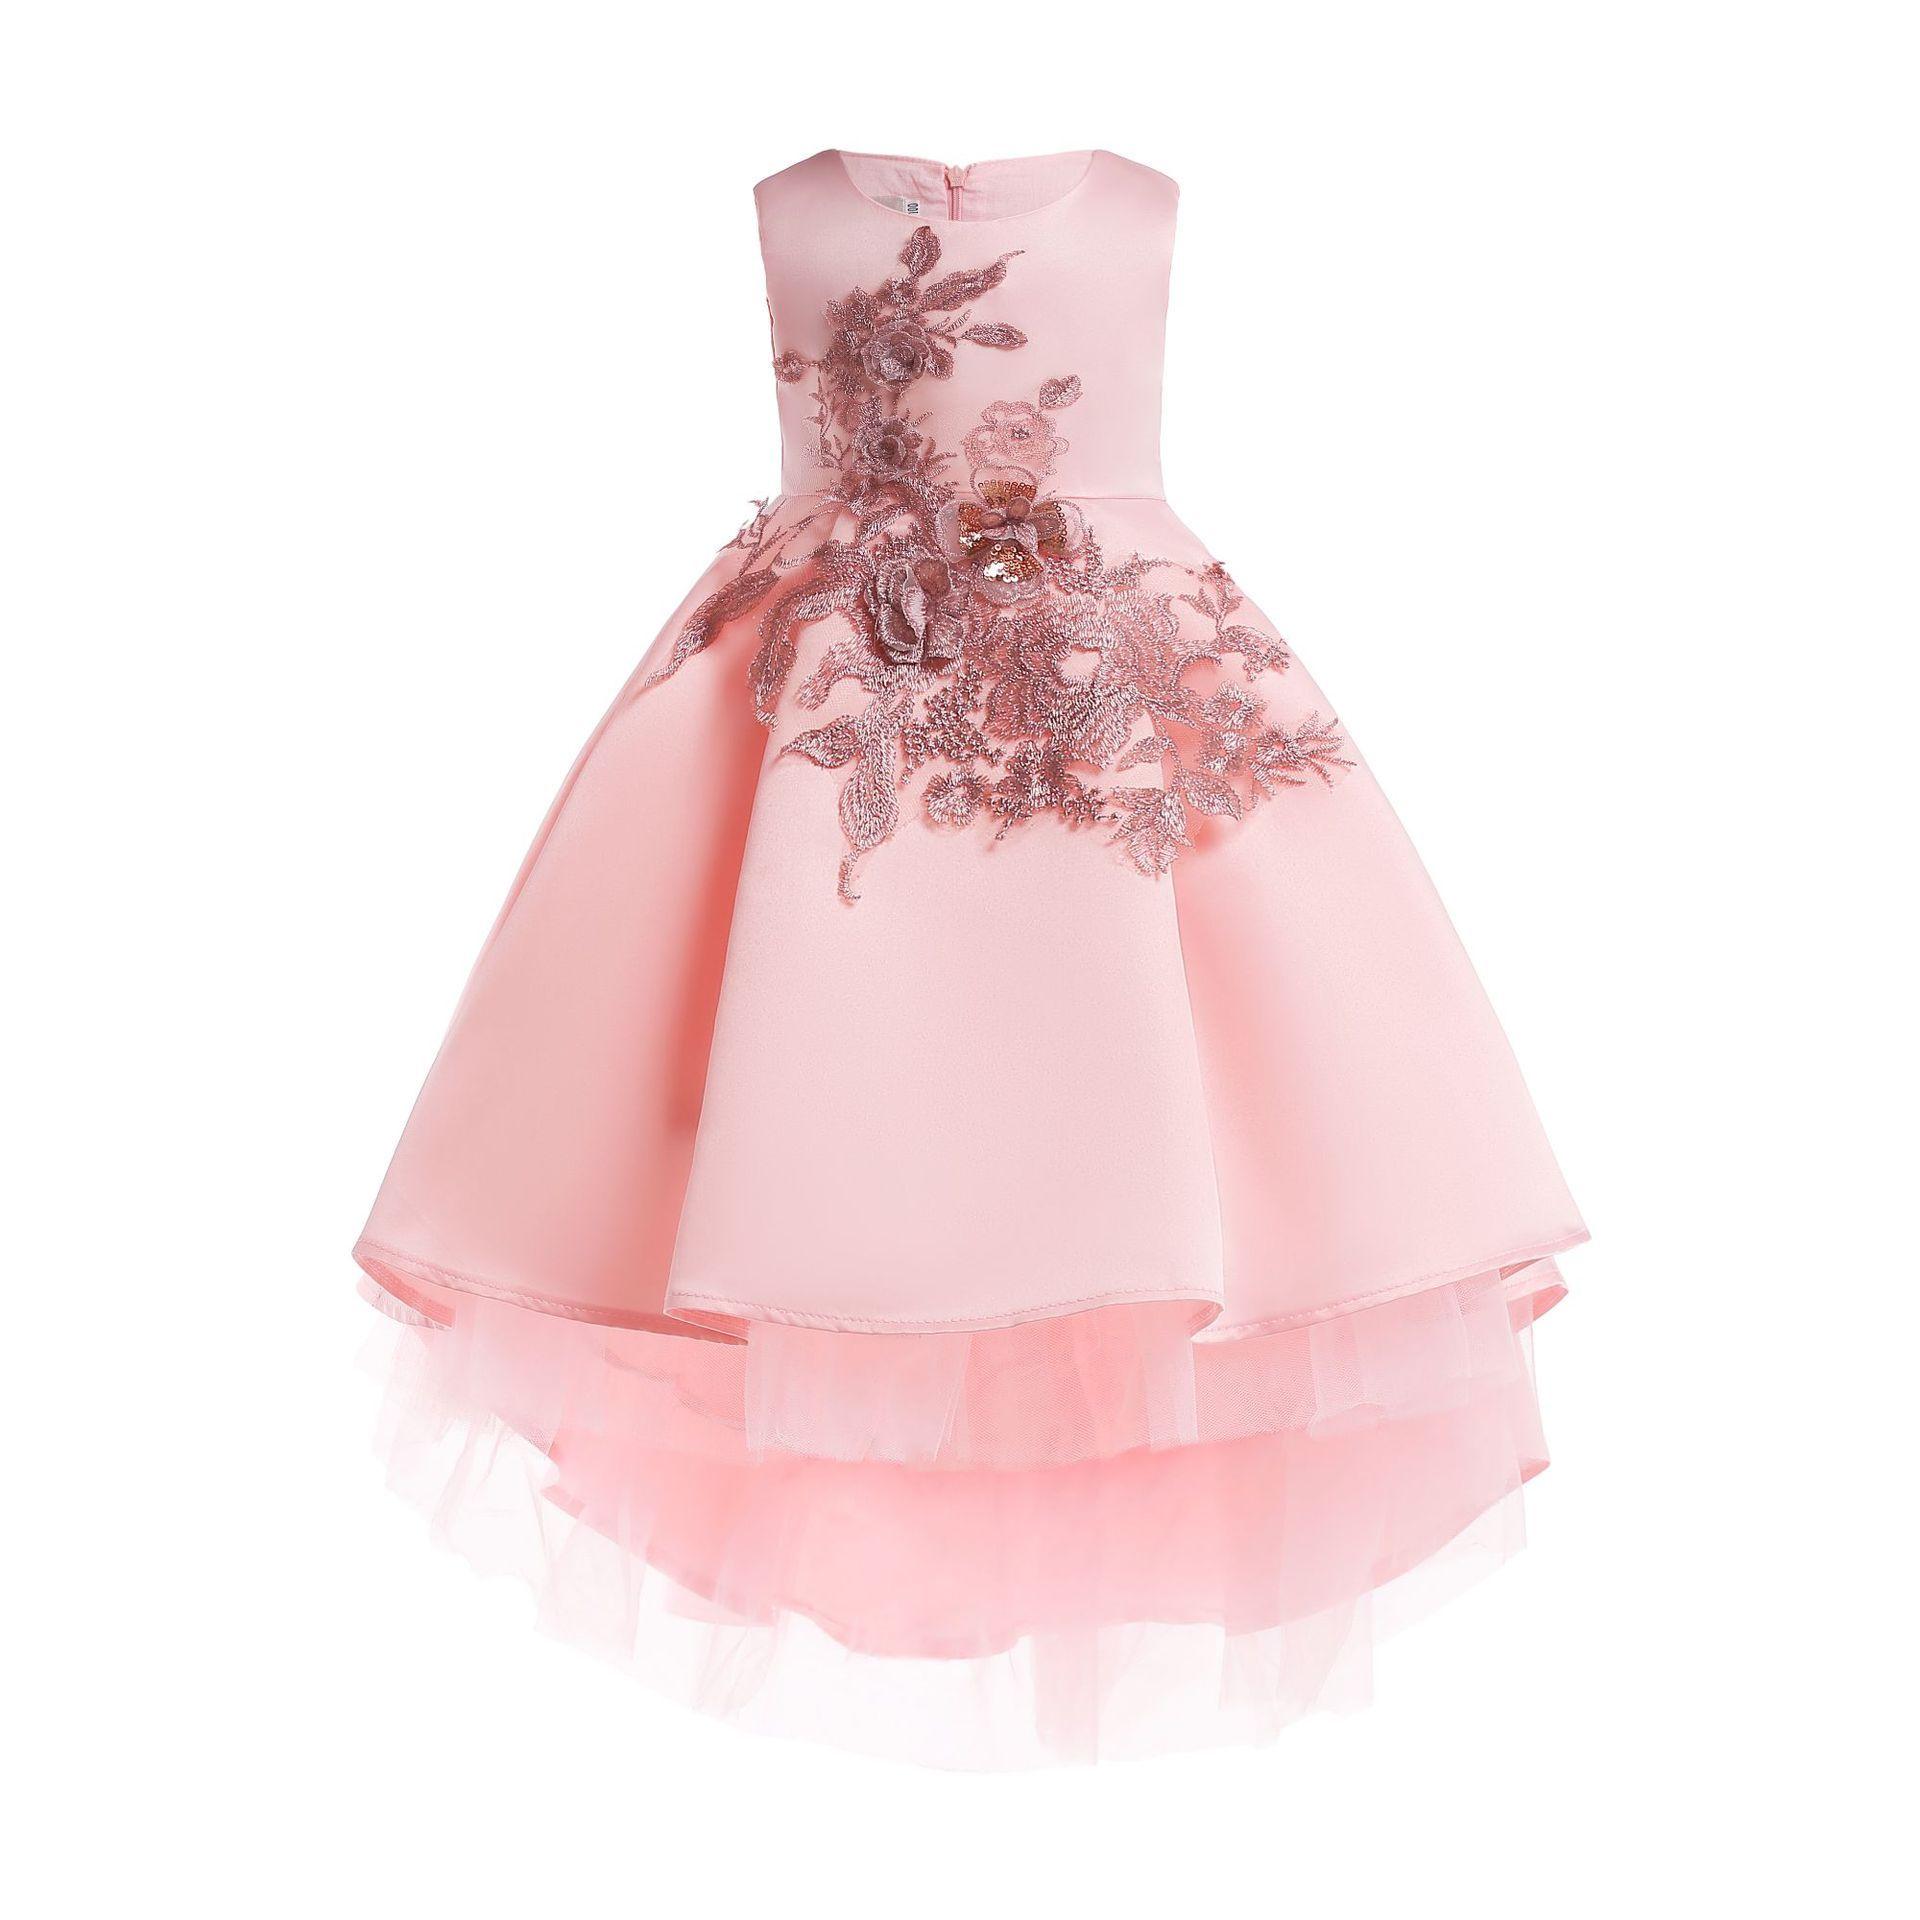 abdb7cadf09f 2019 Baby Girls Princess Dress Elegant Kids Party Dresses For ...